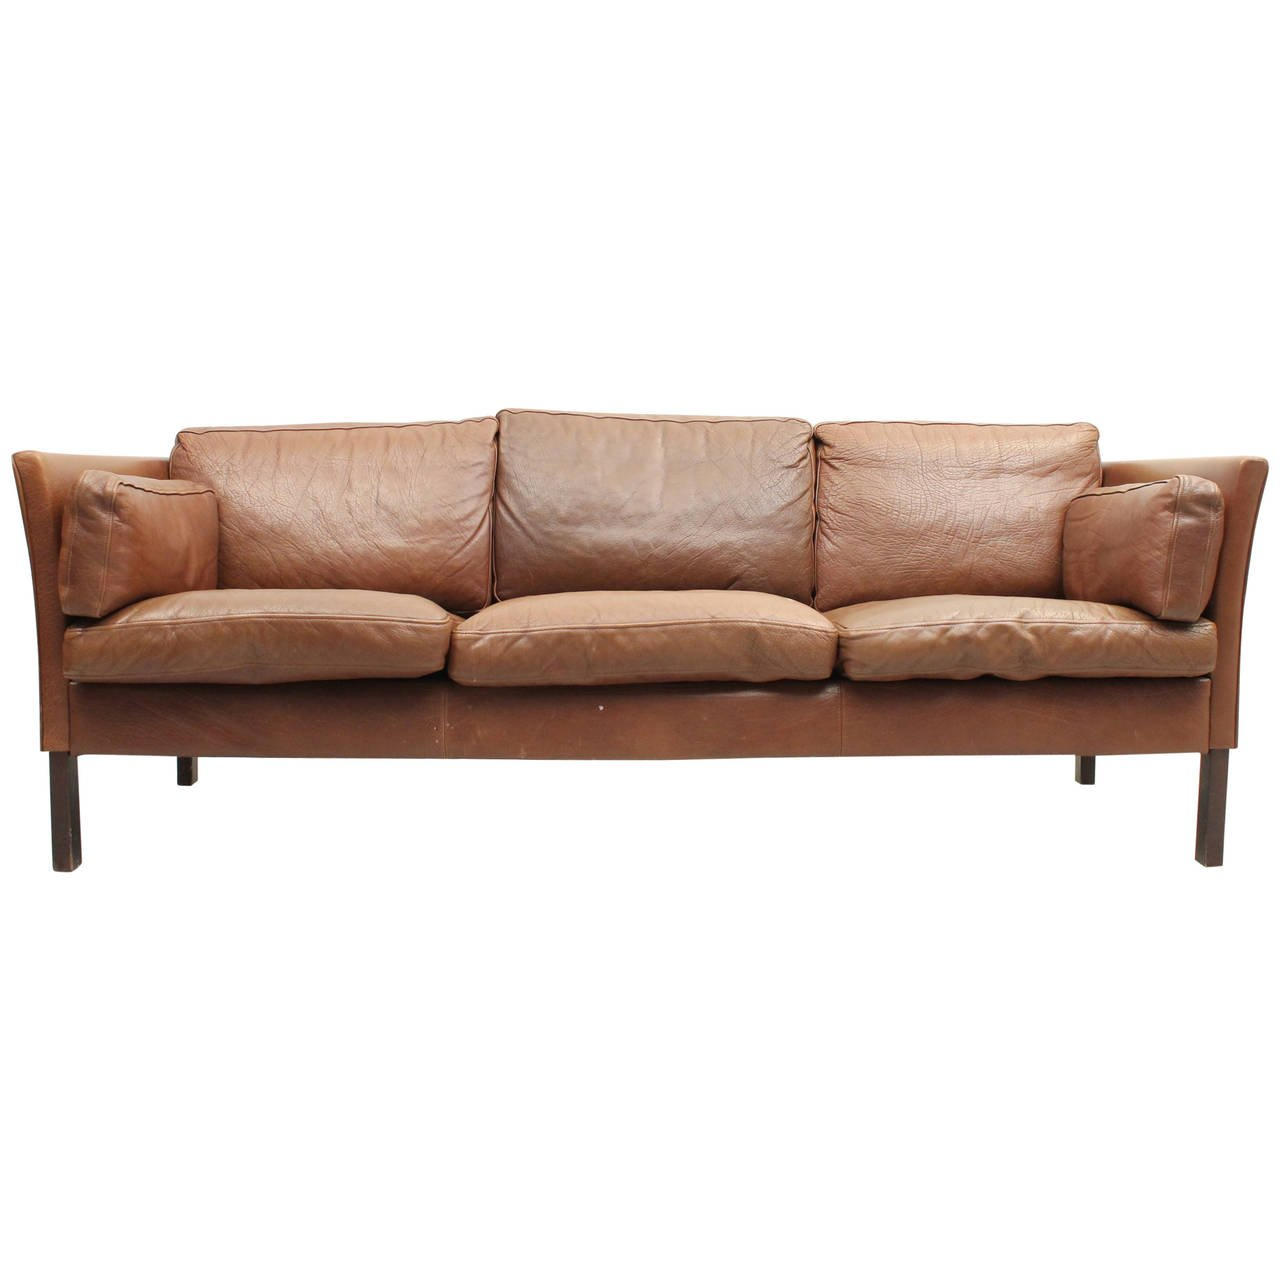 mid century modern sectional sofas photo - 3